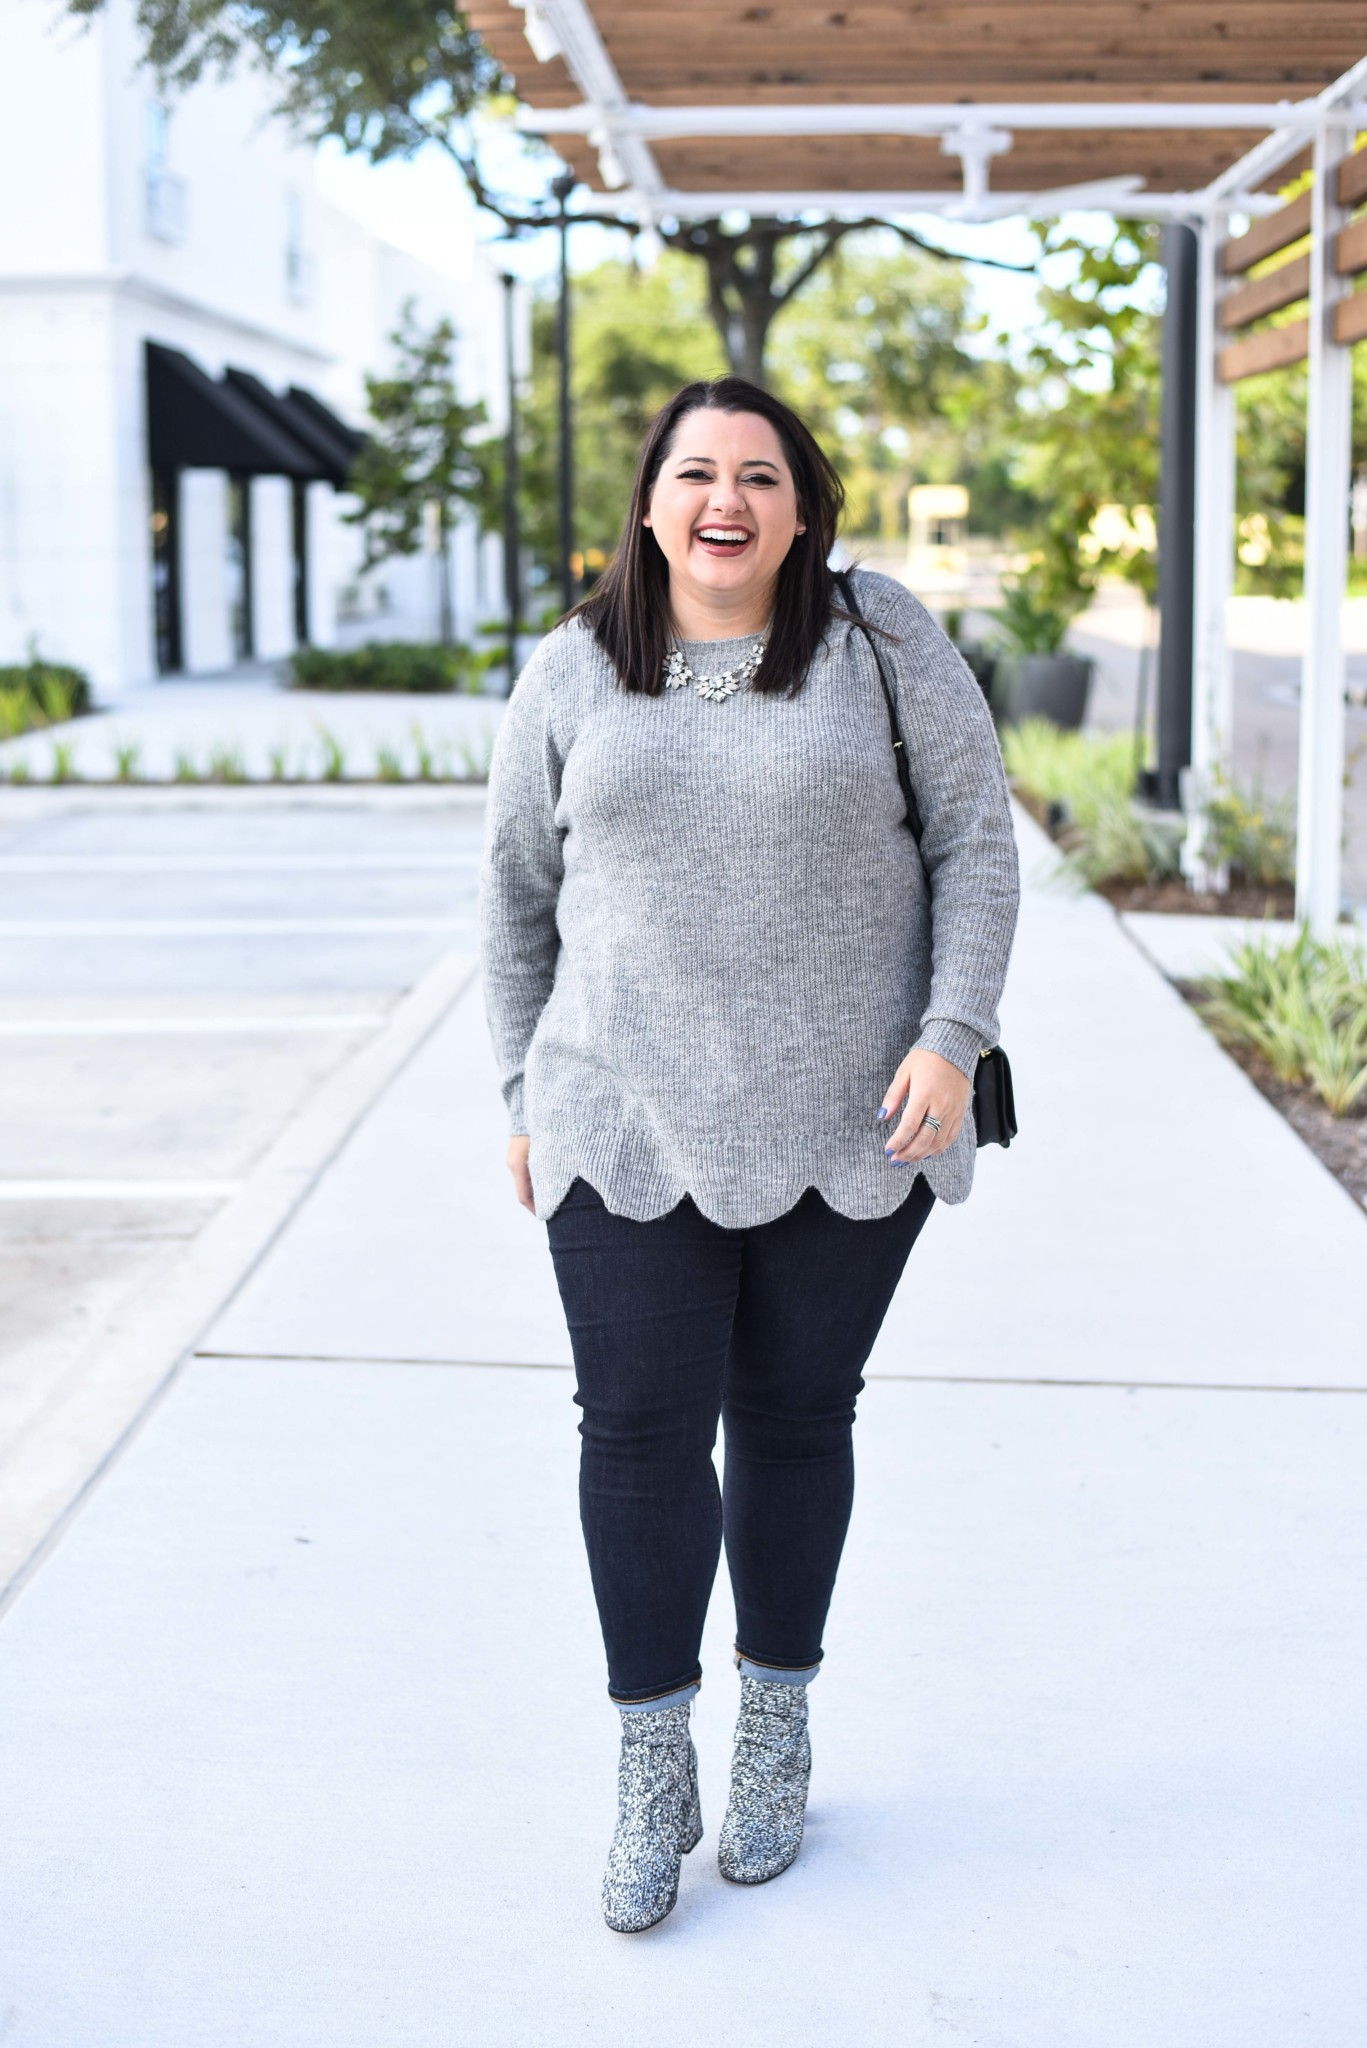 Scallop Hem Sweater from Lane Bryant